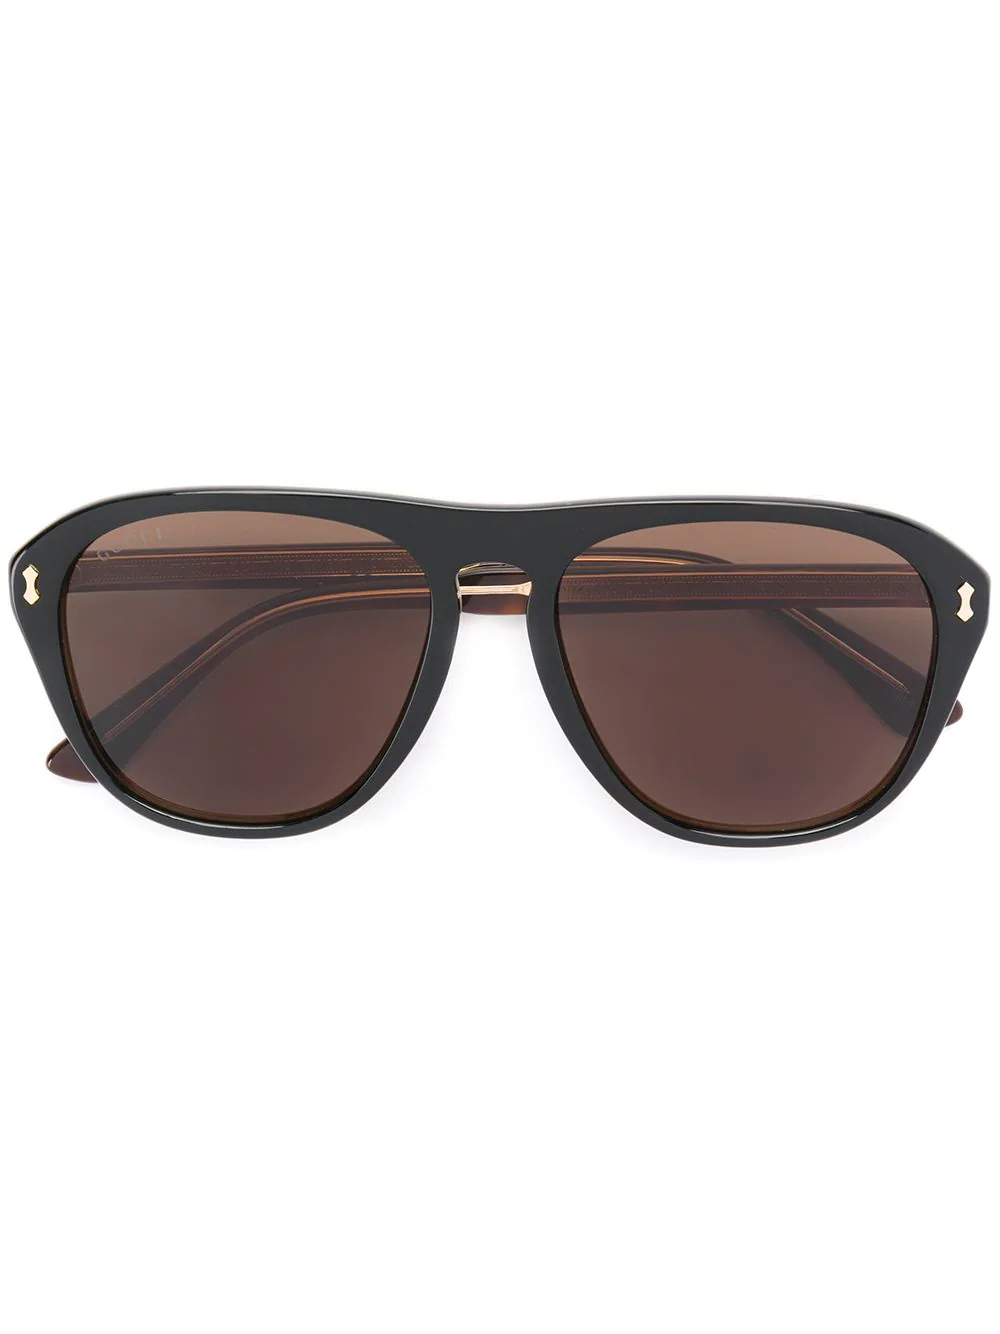 GUCCI | круглые солнцезащитные очки | Clouty